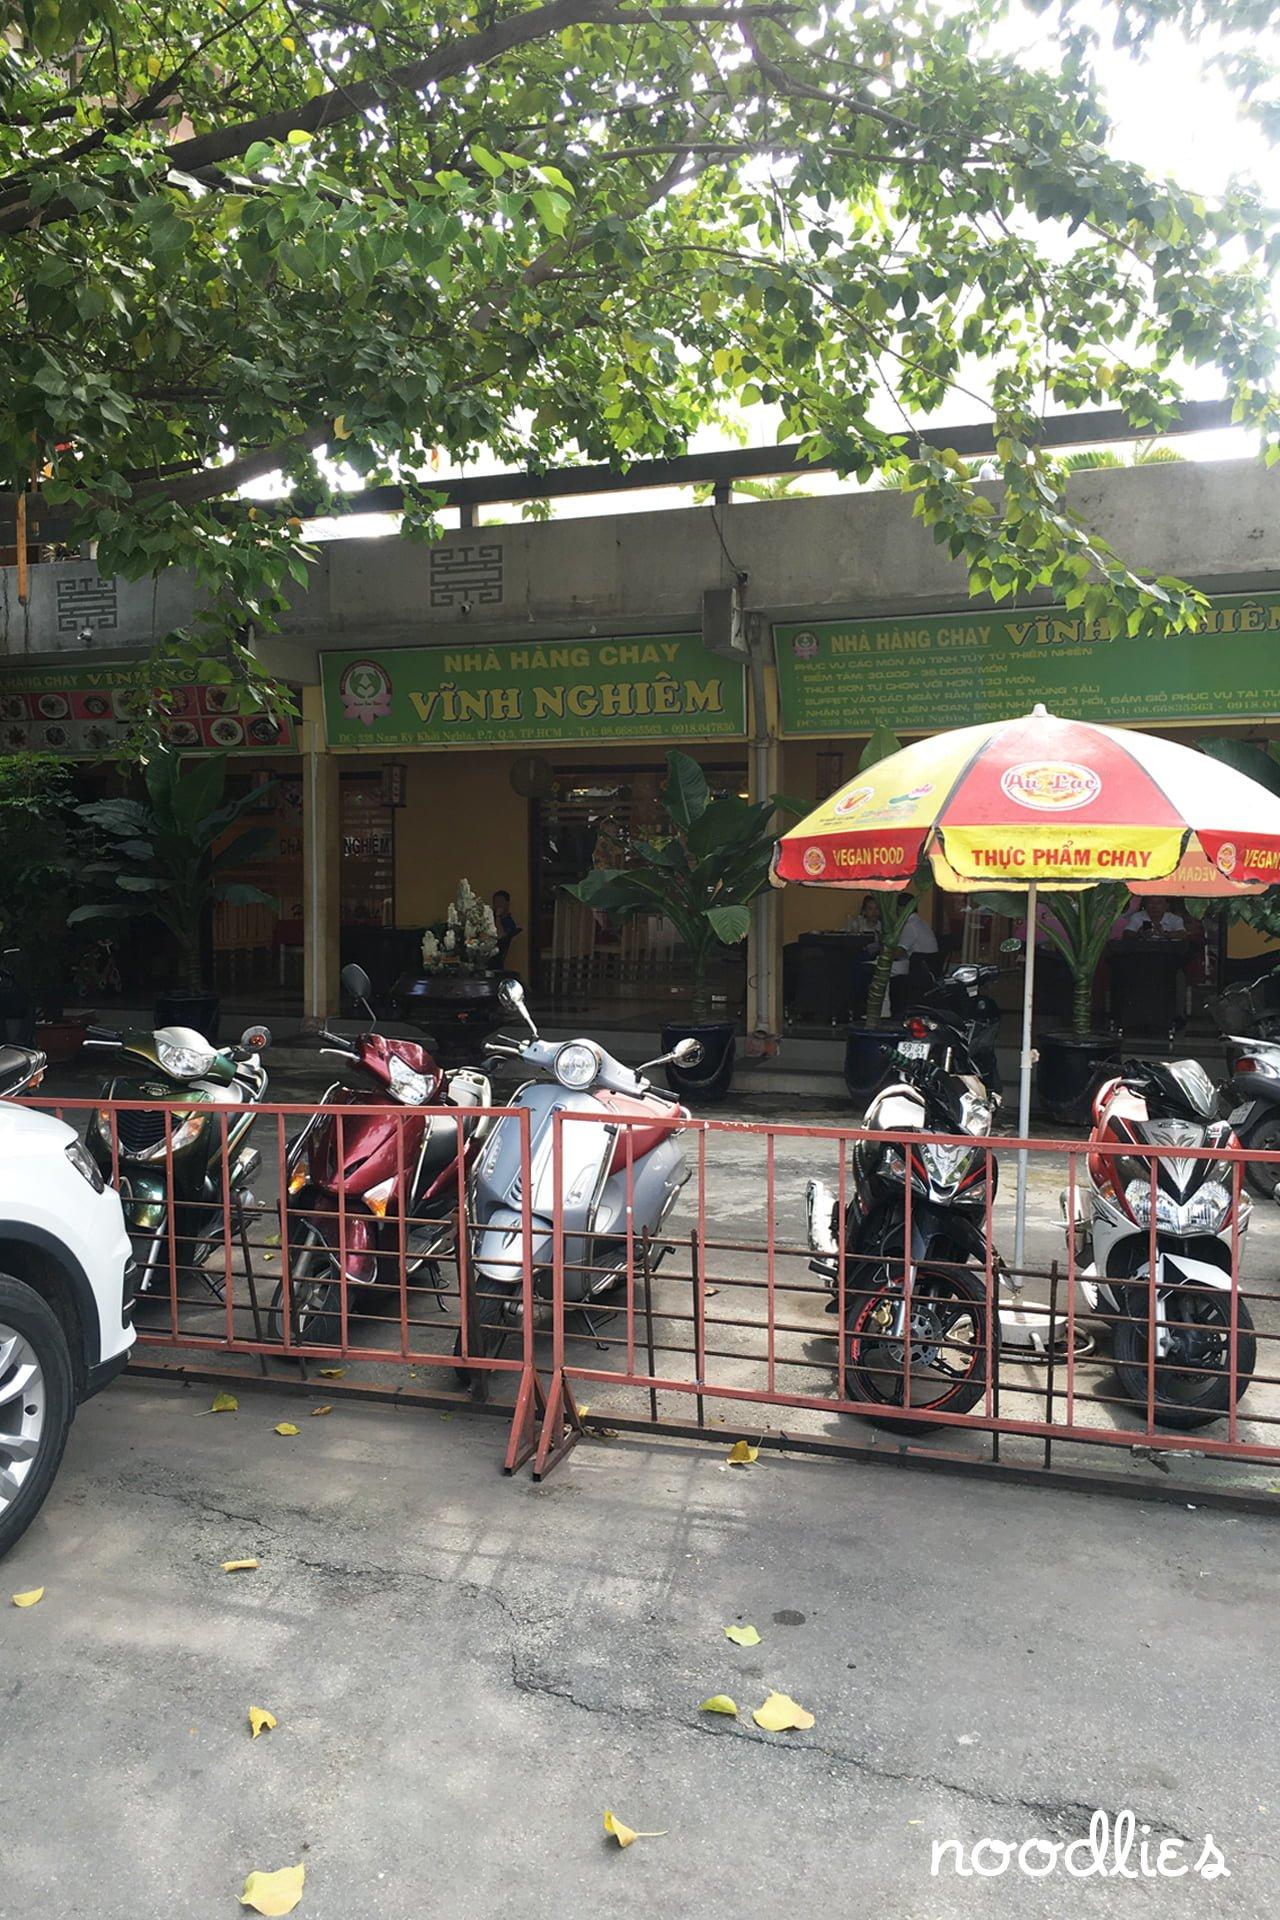 Chua vinh nghiem Vietnam